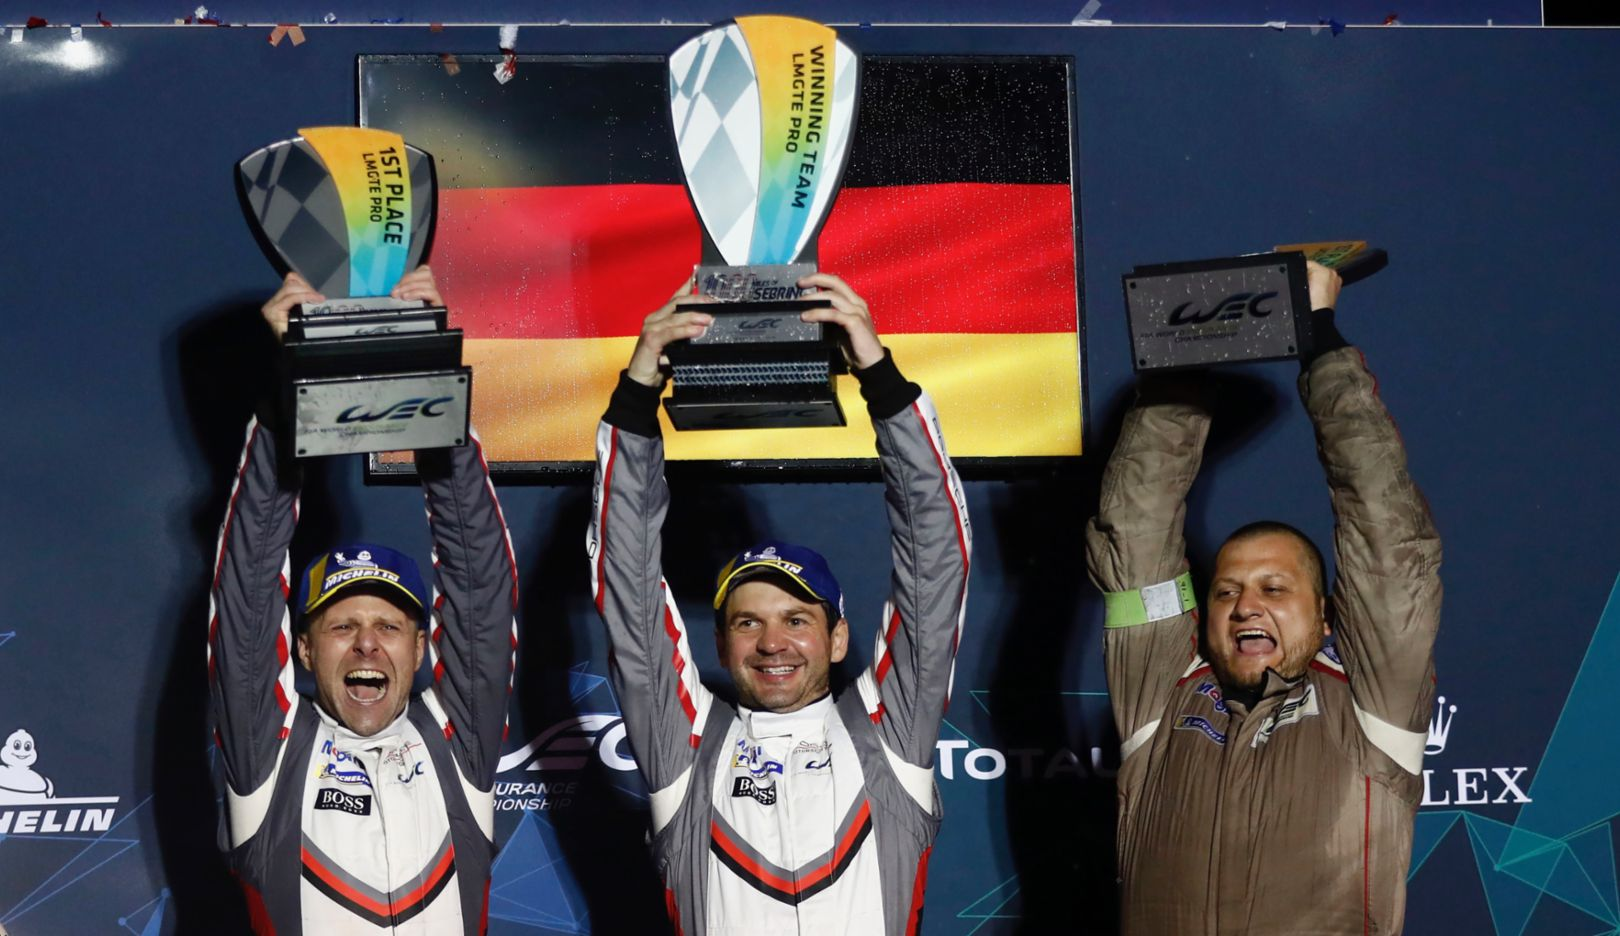 Gianmaria Bruni, Richard Lietz, l-r, Porsche GT Team, race, round six, WEC, Sebring, 2019, Porsche AG